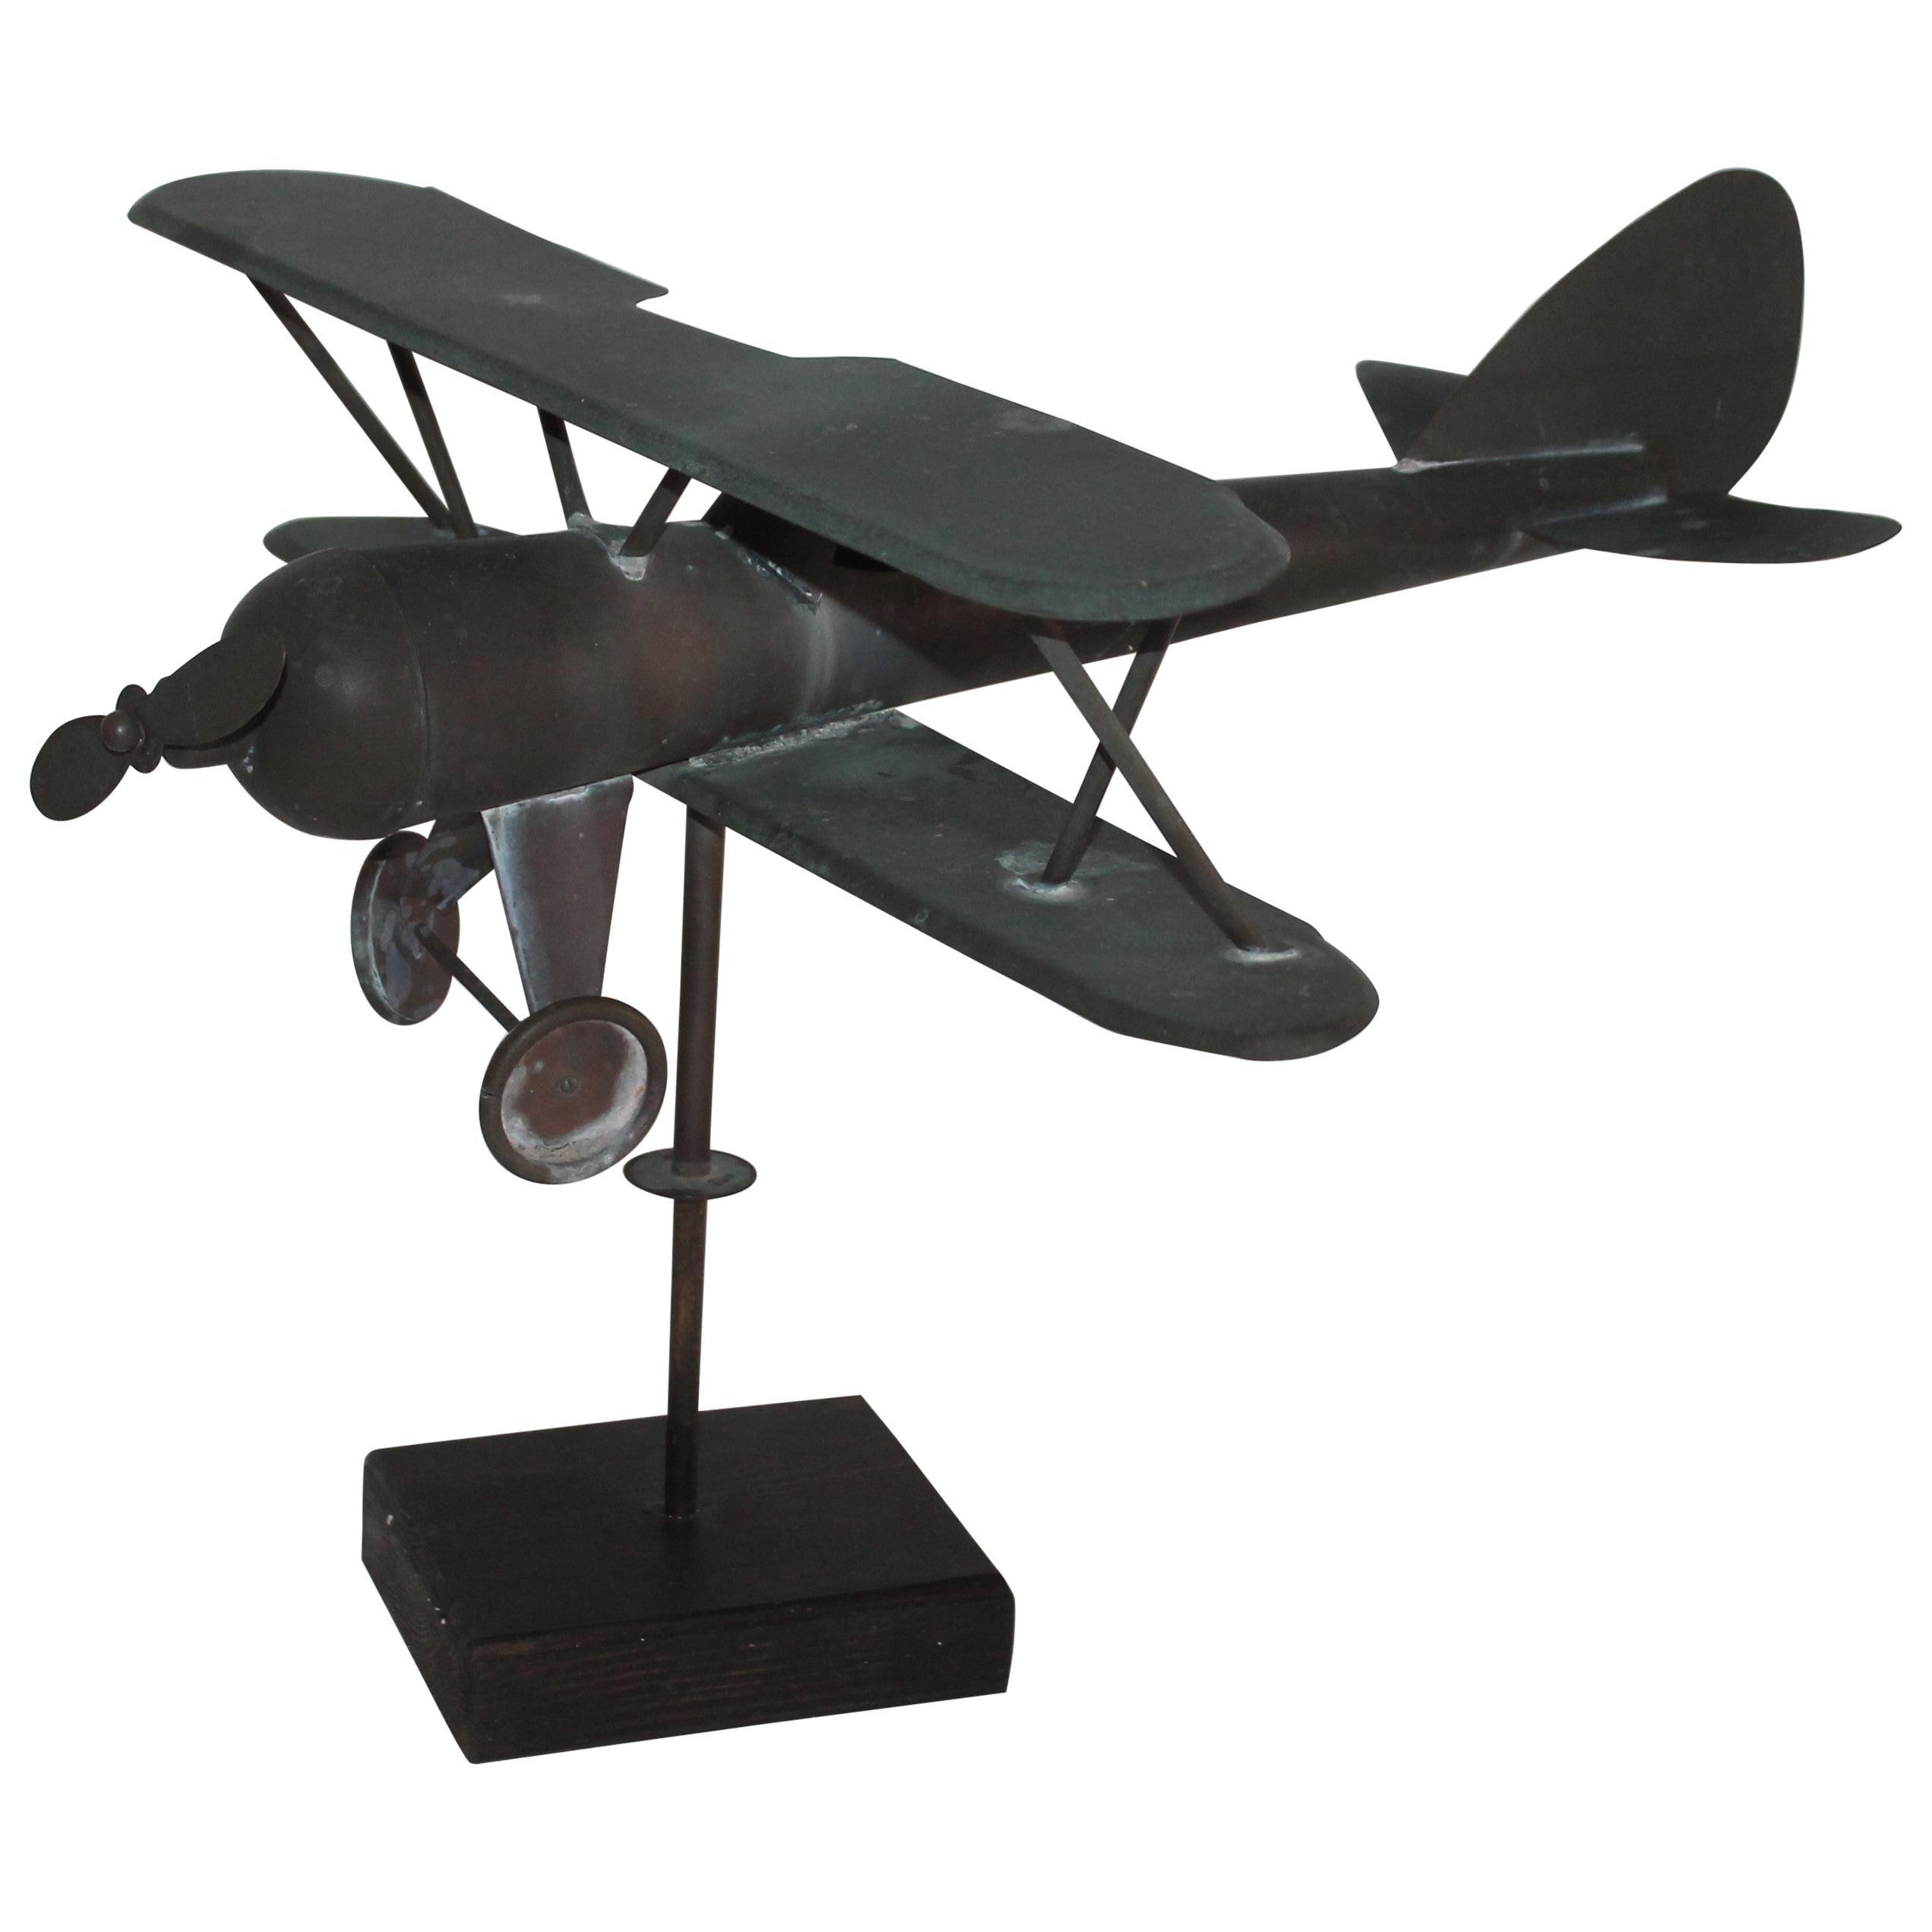 20th Century Patinaed Copper Airplane Weather Vane, Rare